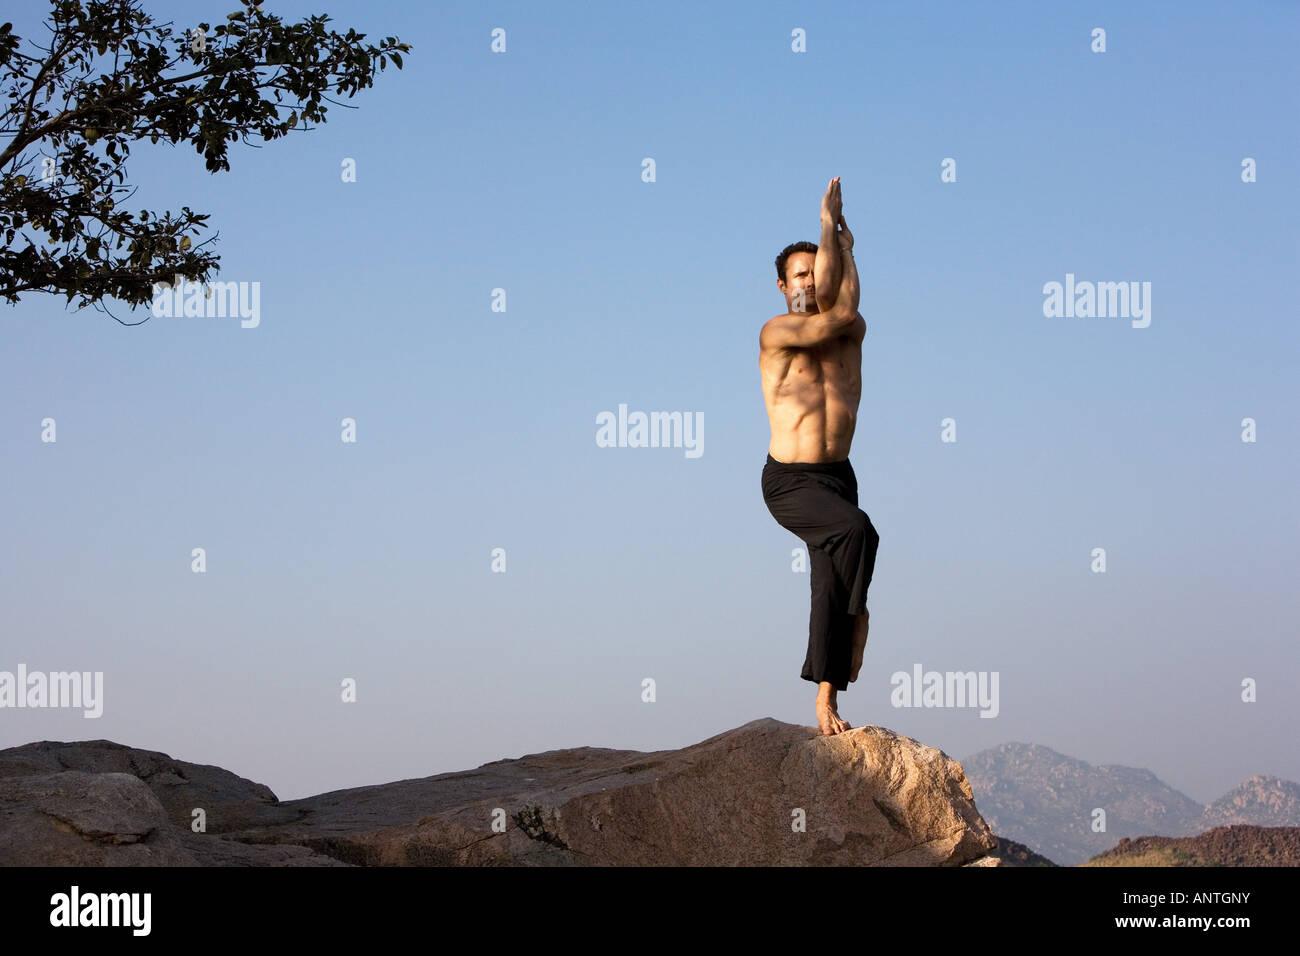 Man performing Hatha Yoga Garudasana eagle pose on a rock in India - Stock Image